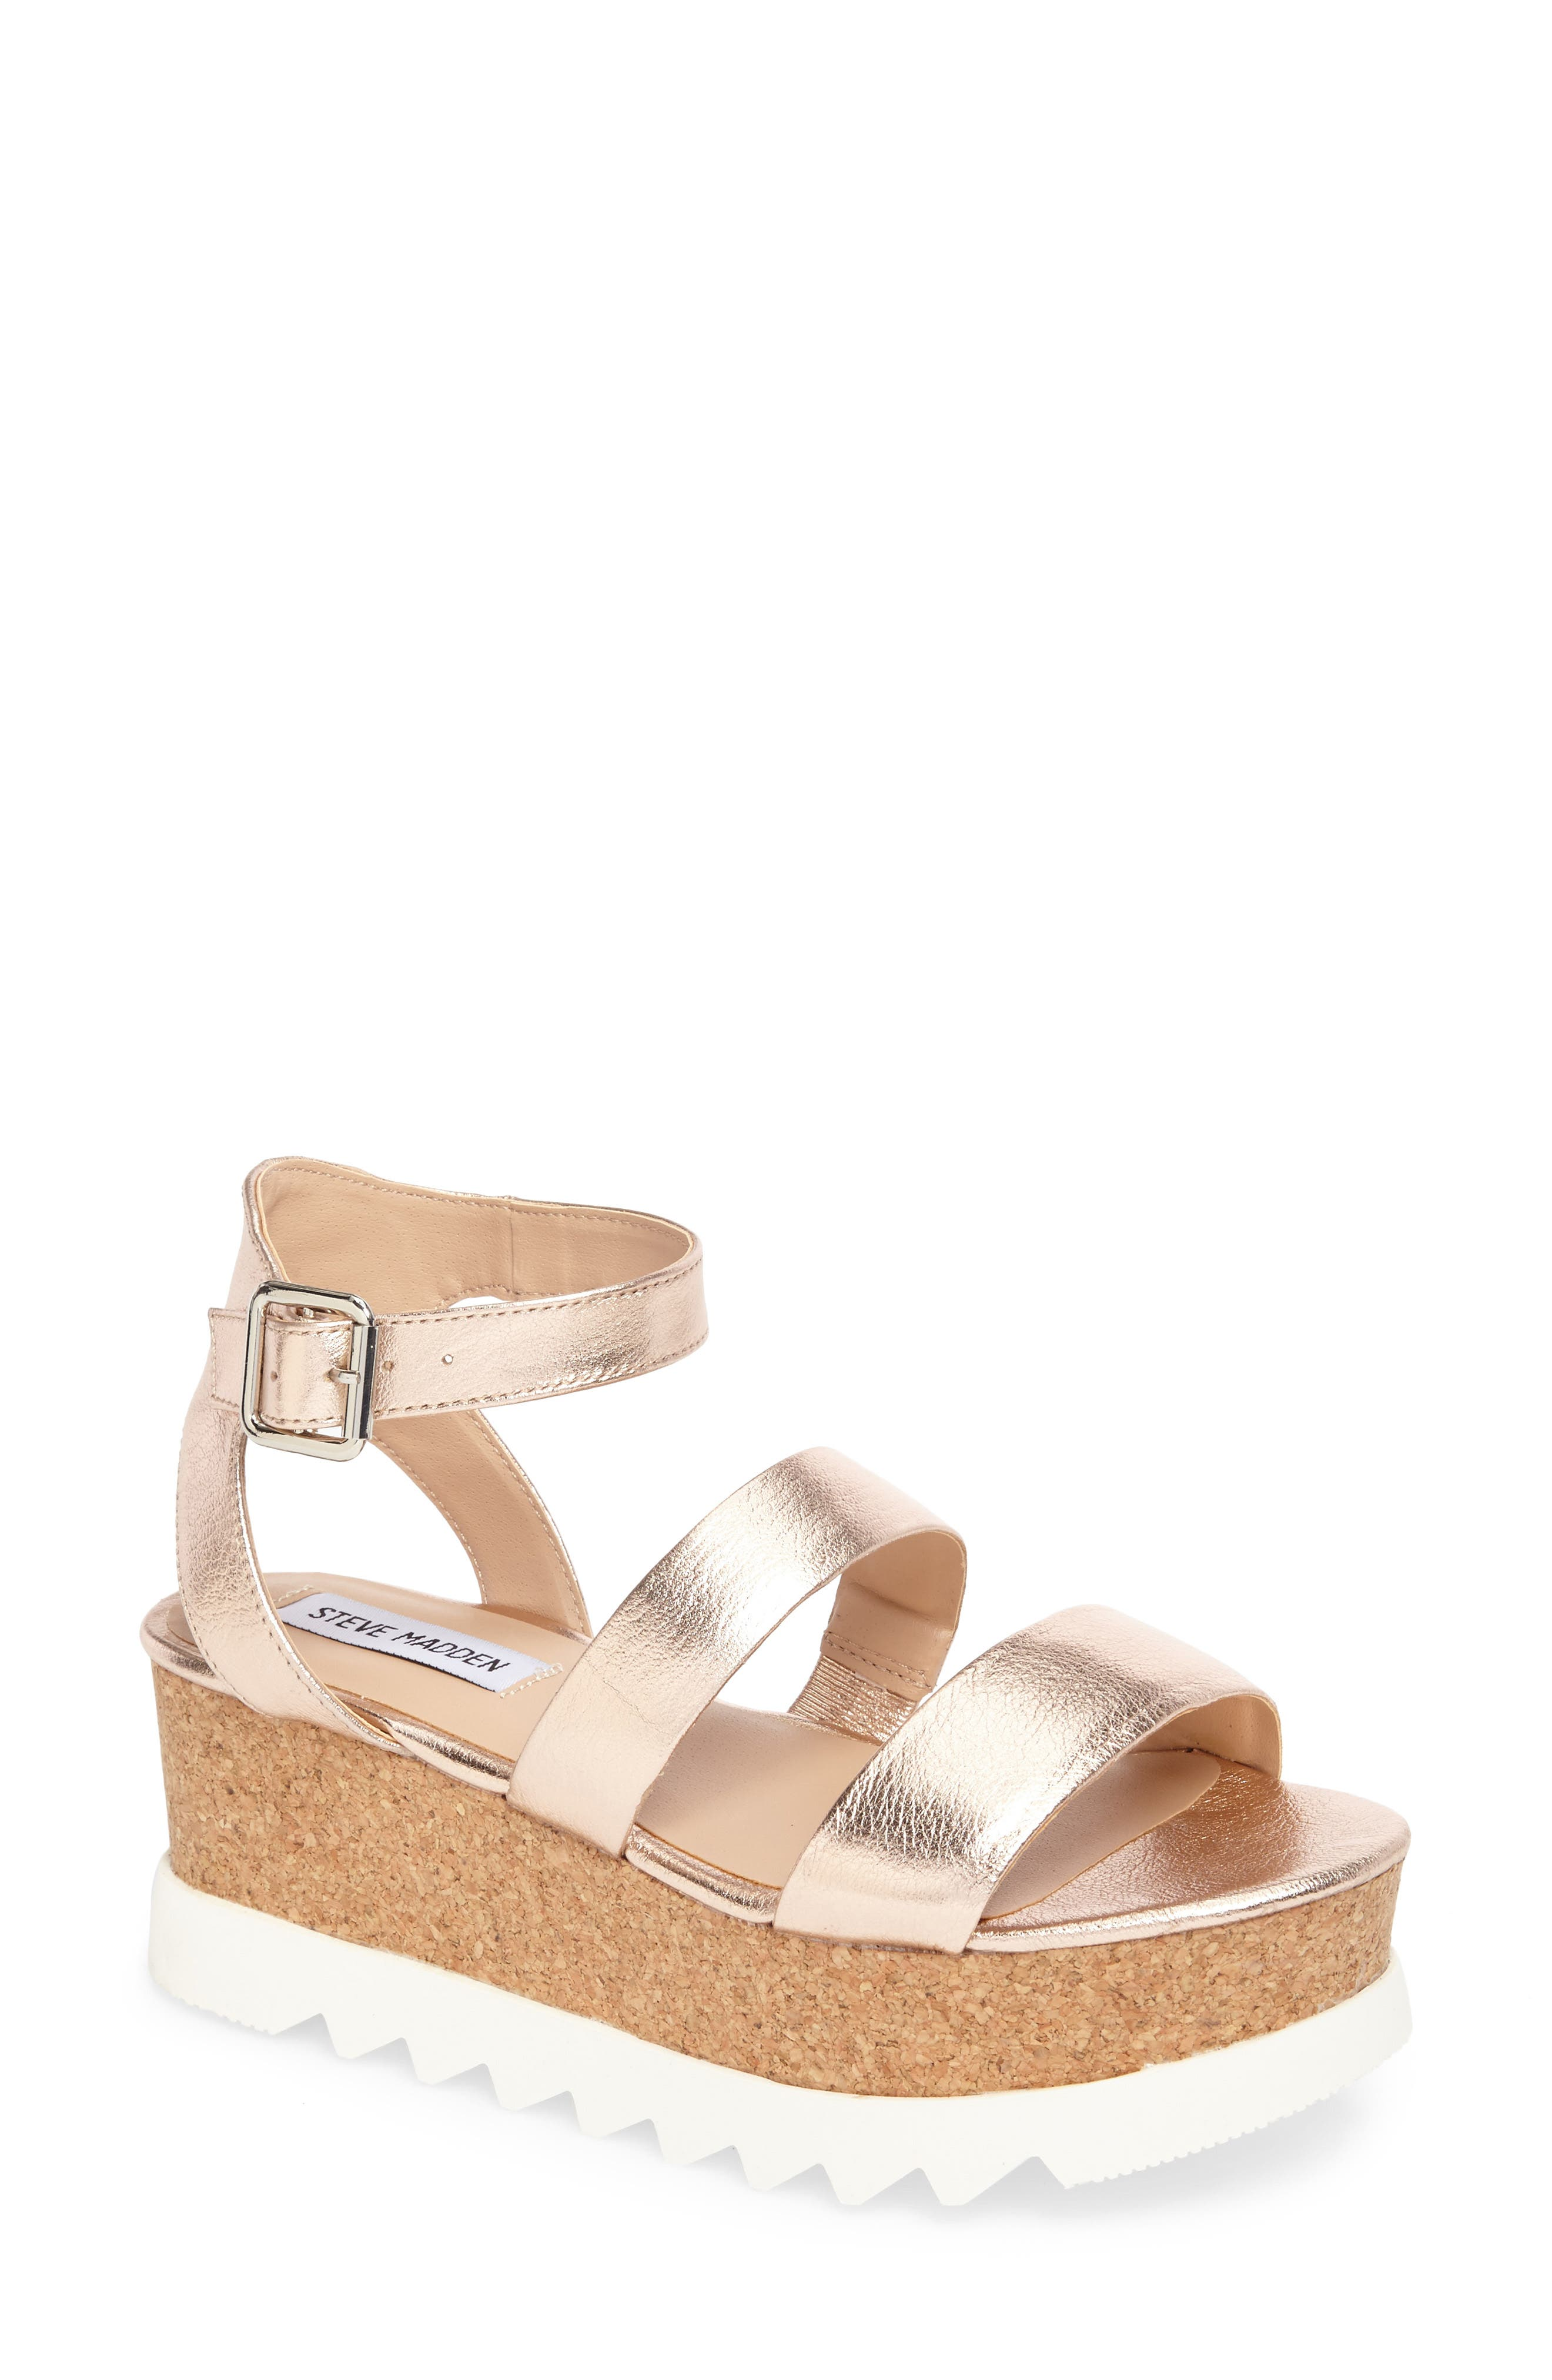 Kirsten Layered Platform Sandal,                         Main,                         color, Rose Leather